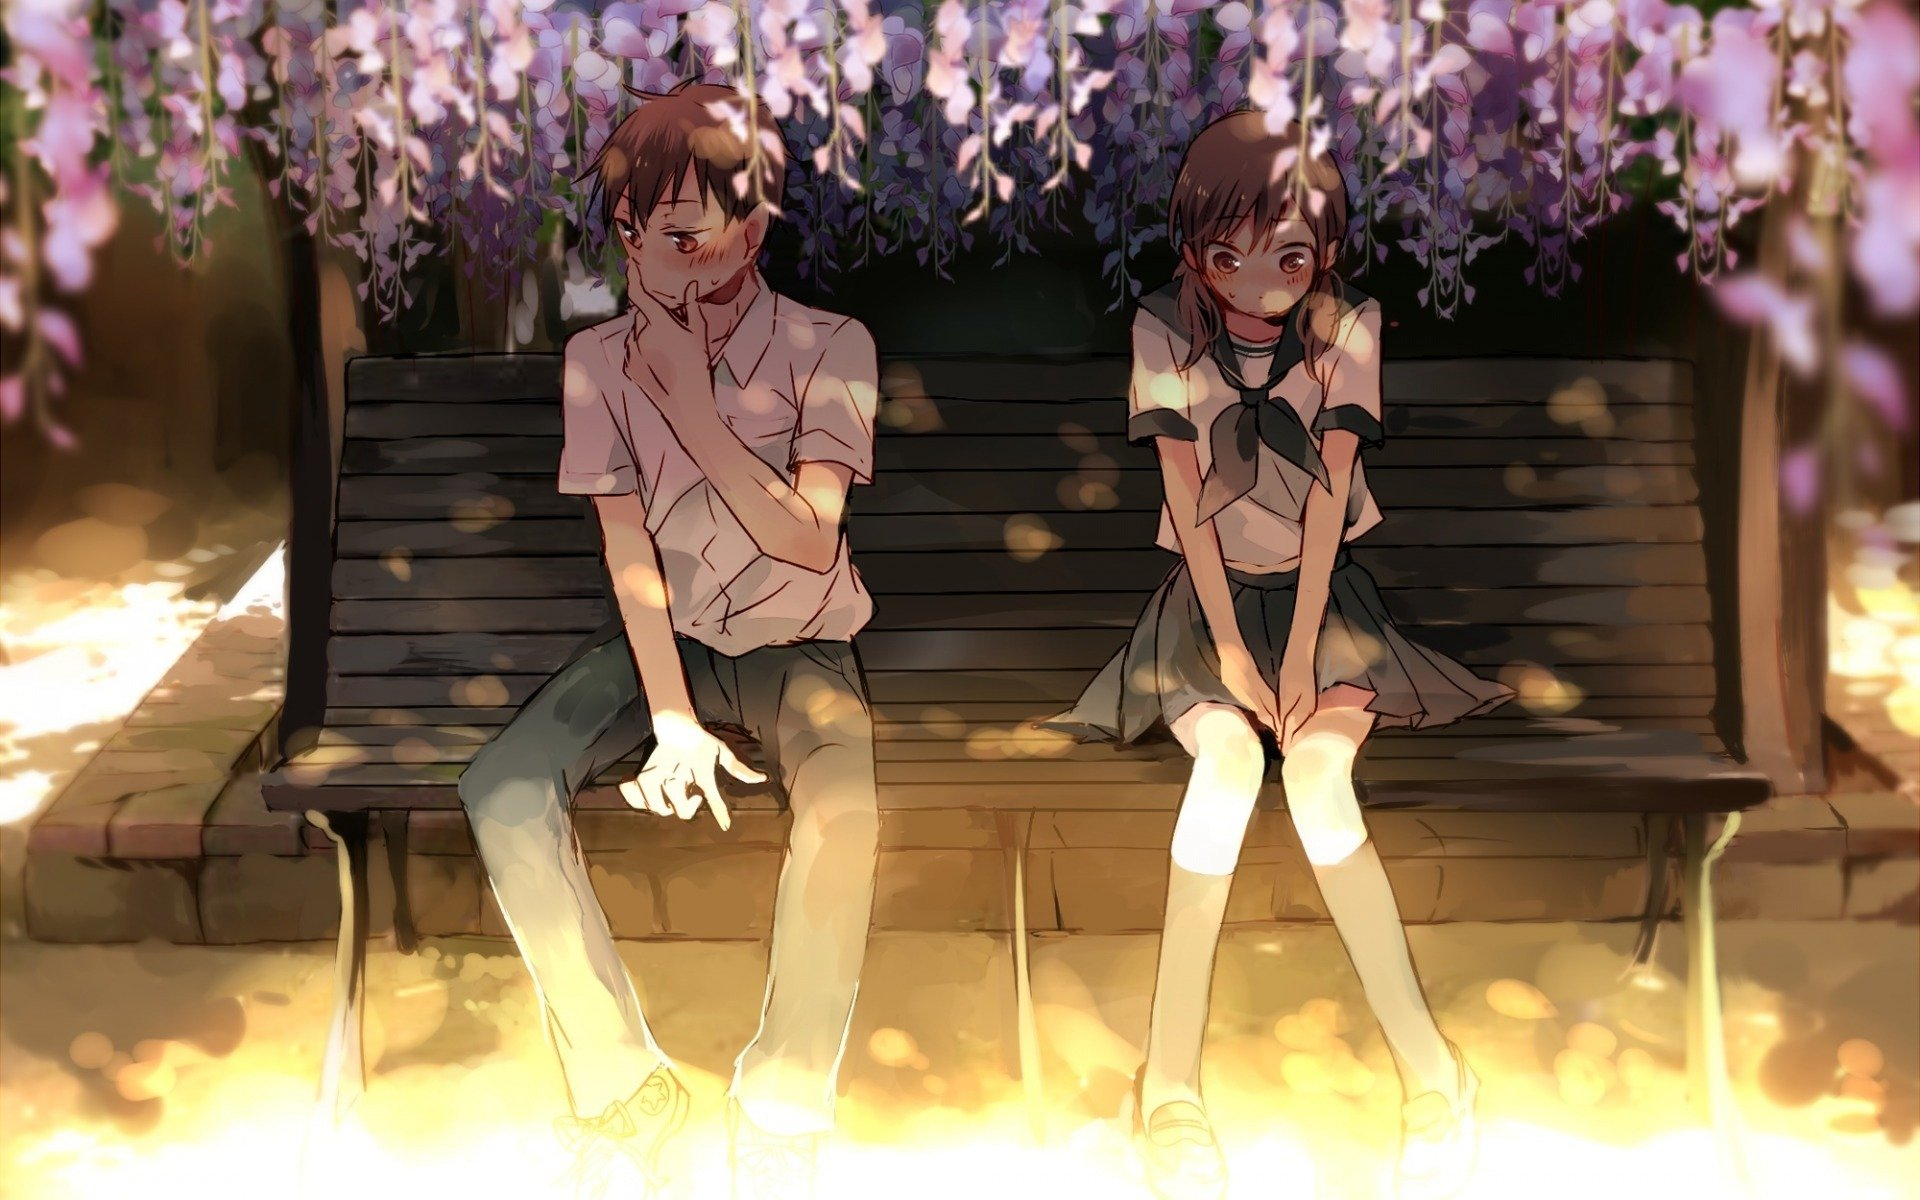 Tall Boy Short Girl Couple Wallpaper Cute Anime Girl Beautiful Short Hair Couple Love Boy